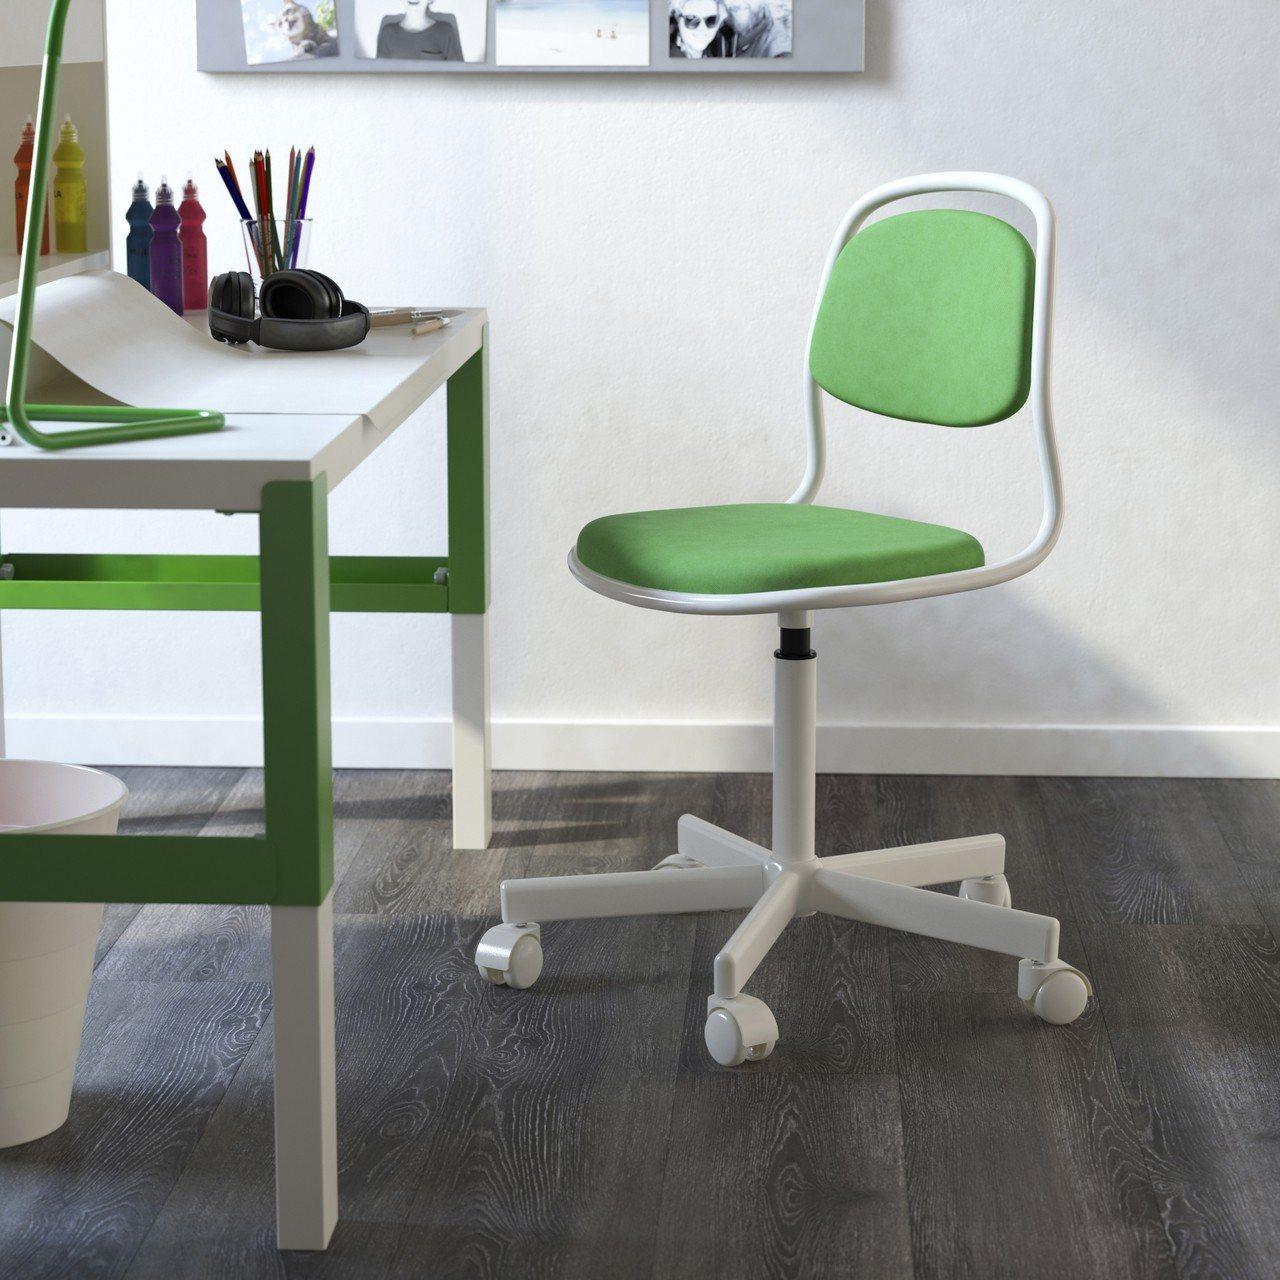 ORFJALL兒童書桌椅,原價1,299元、特價699元。圖/IKEA提供